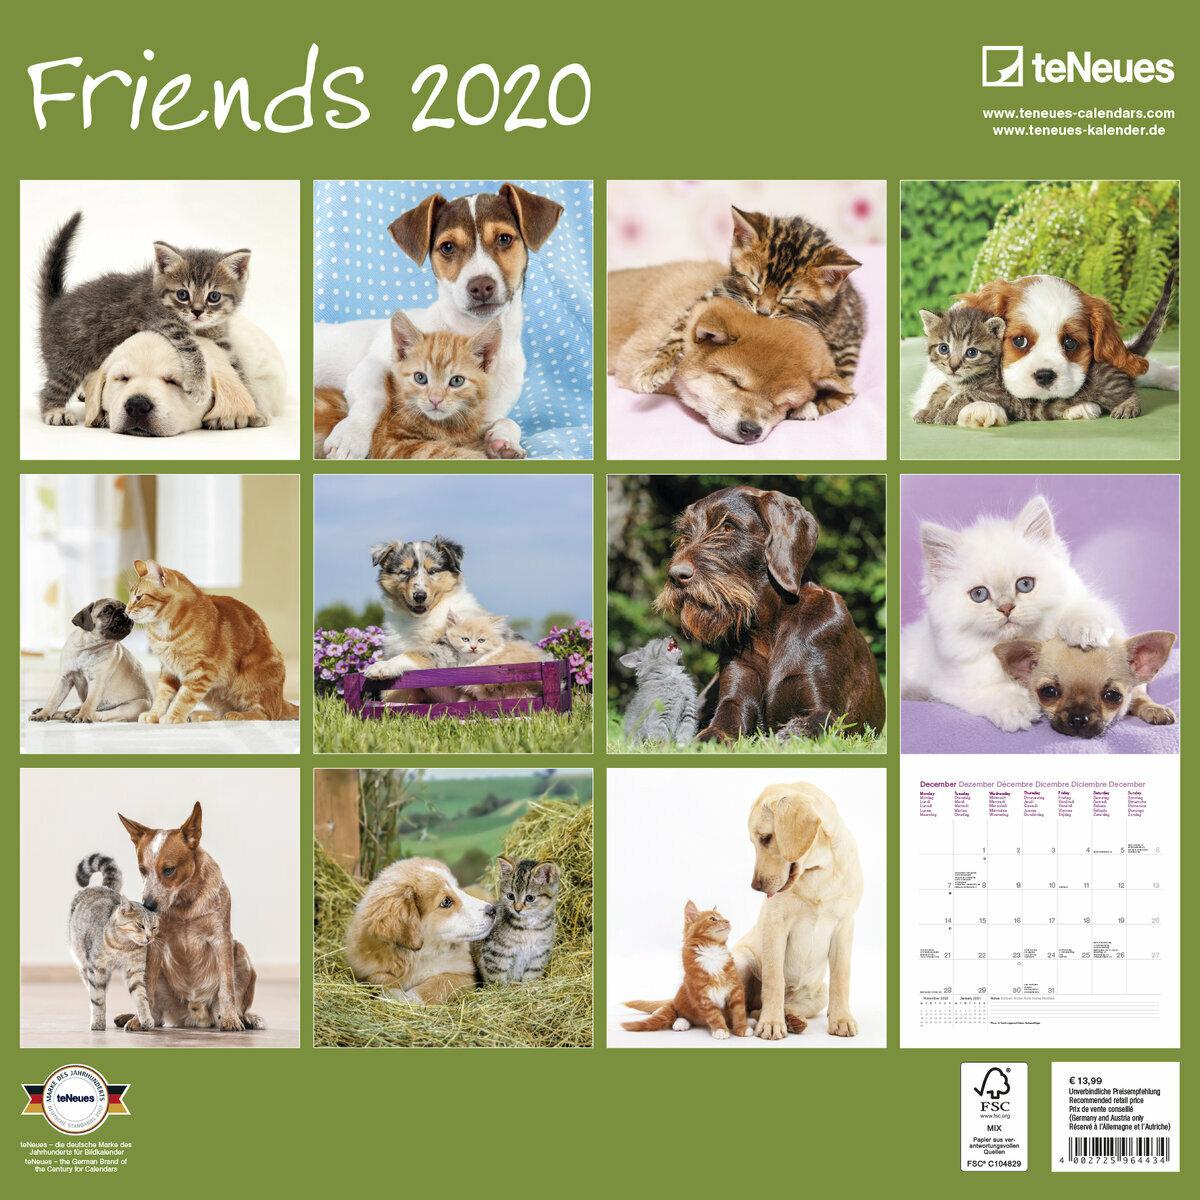 Fun Chiens 2020 Chien Calendrier mural 2020 2020